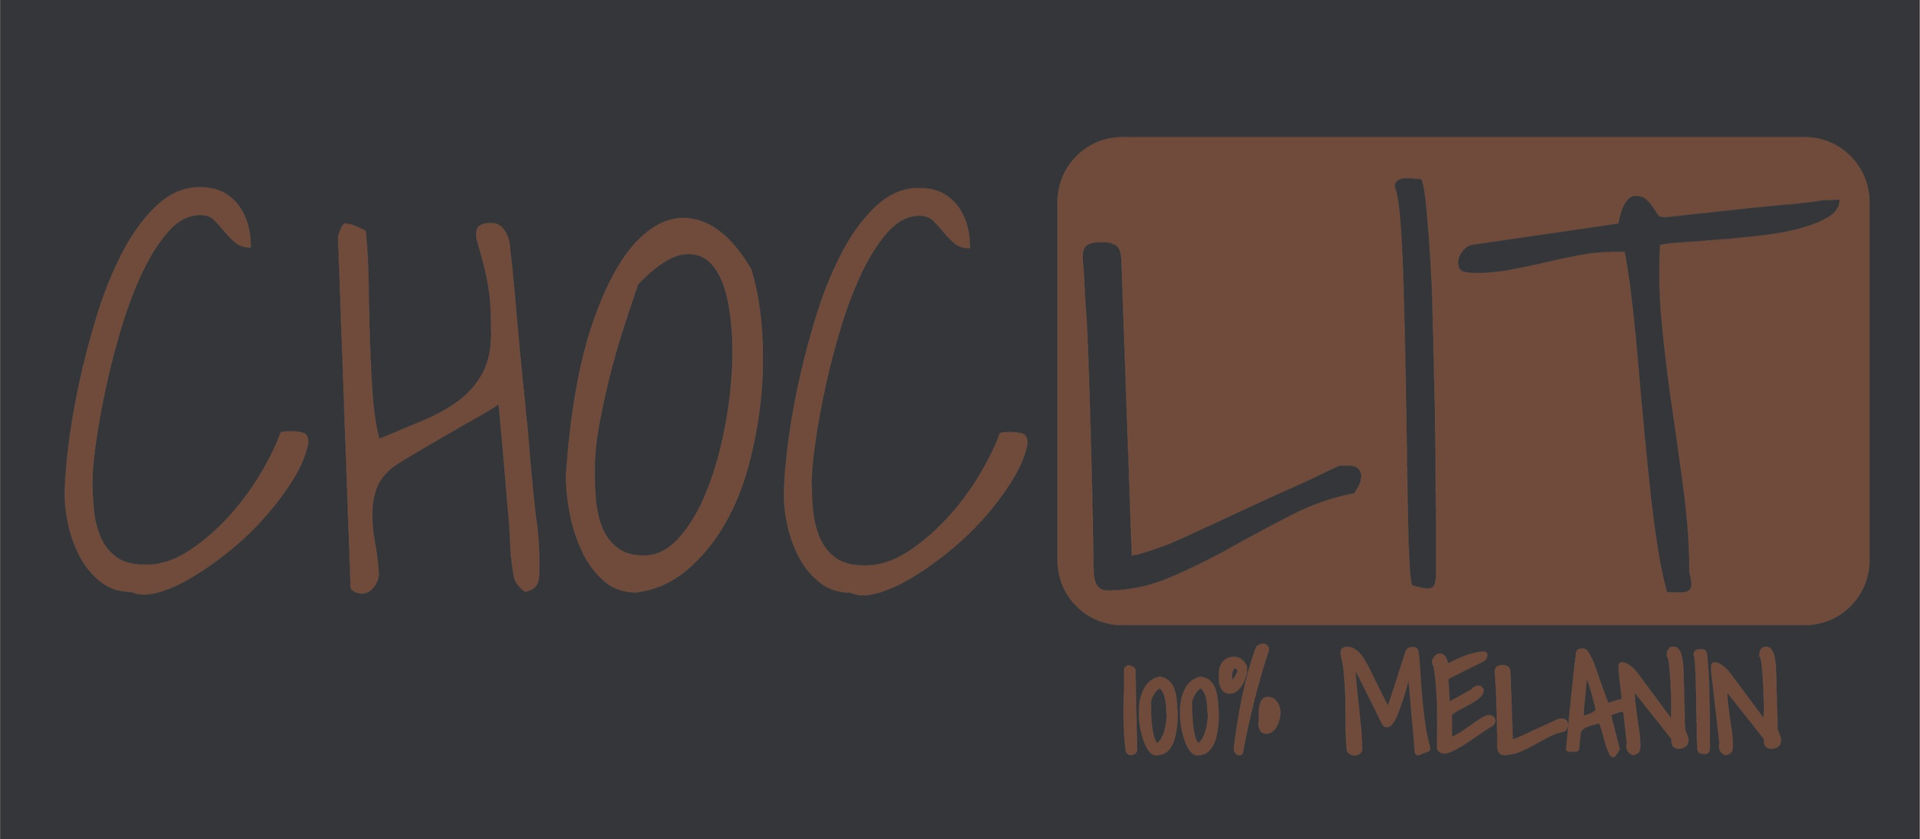 ChocLIT Black